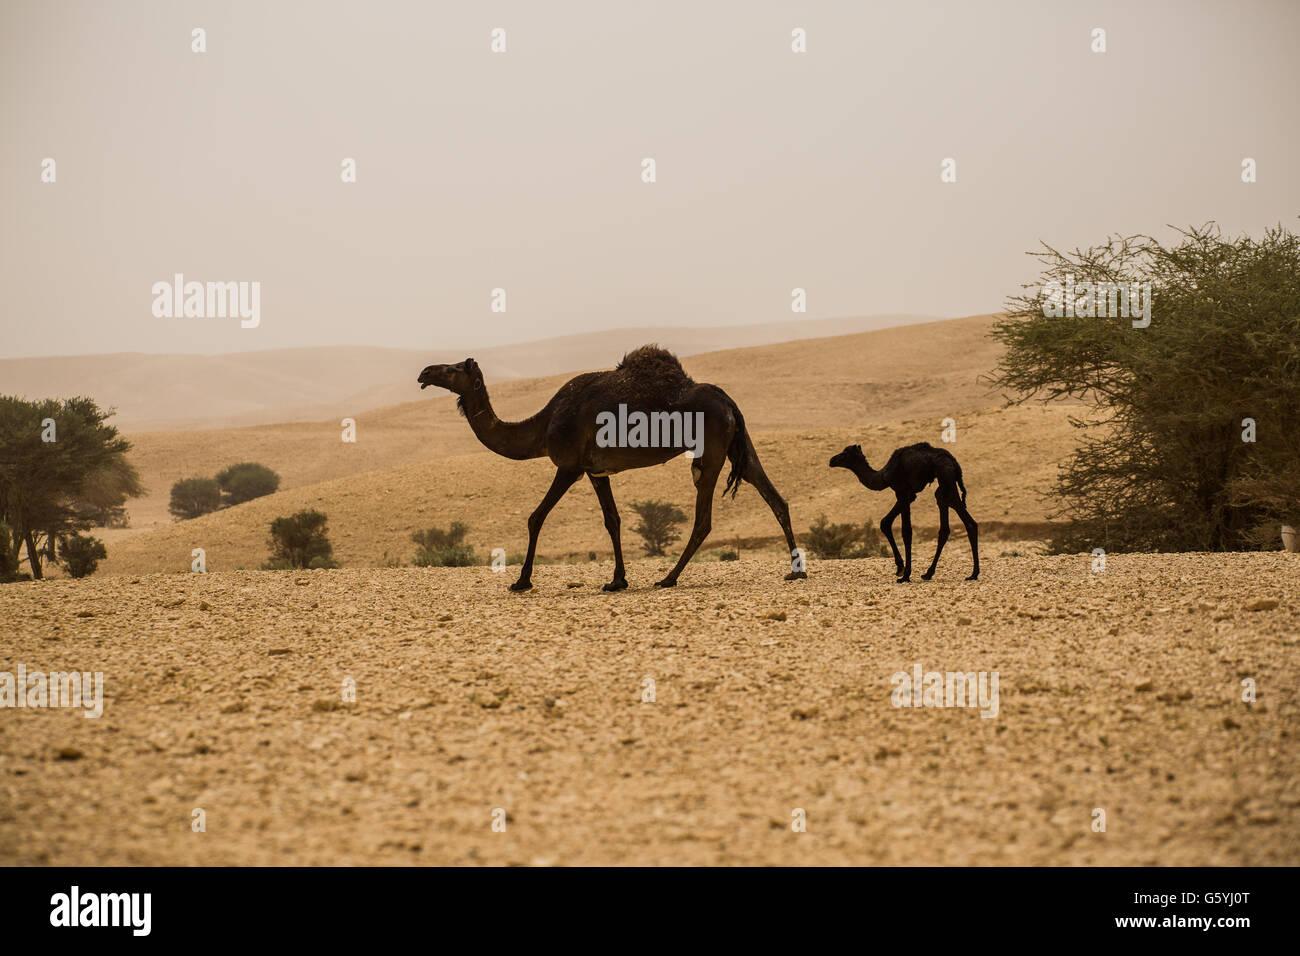 Kamel et bébé kamel en Arabie Saoudite désert Photo Stock